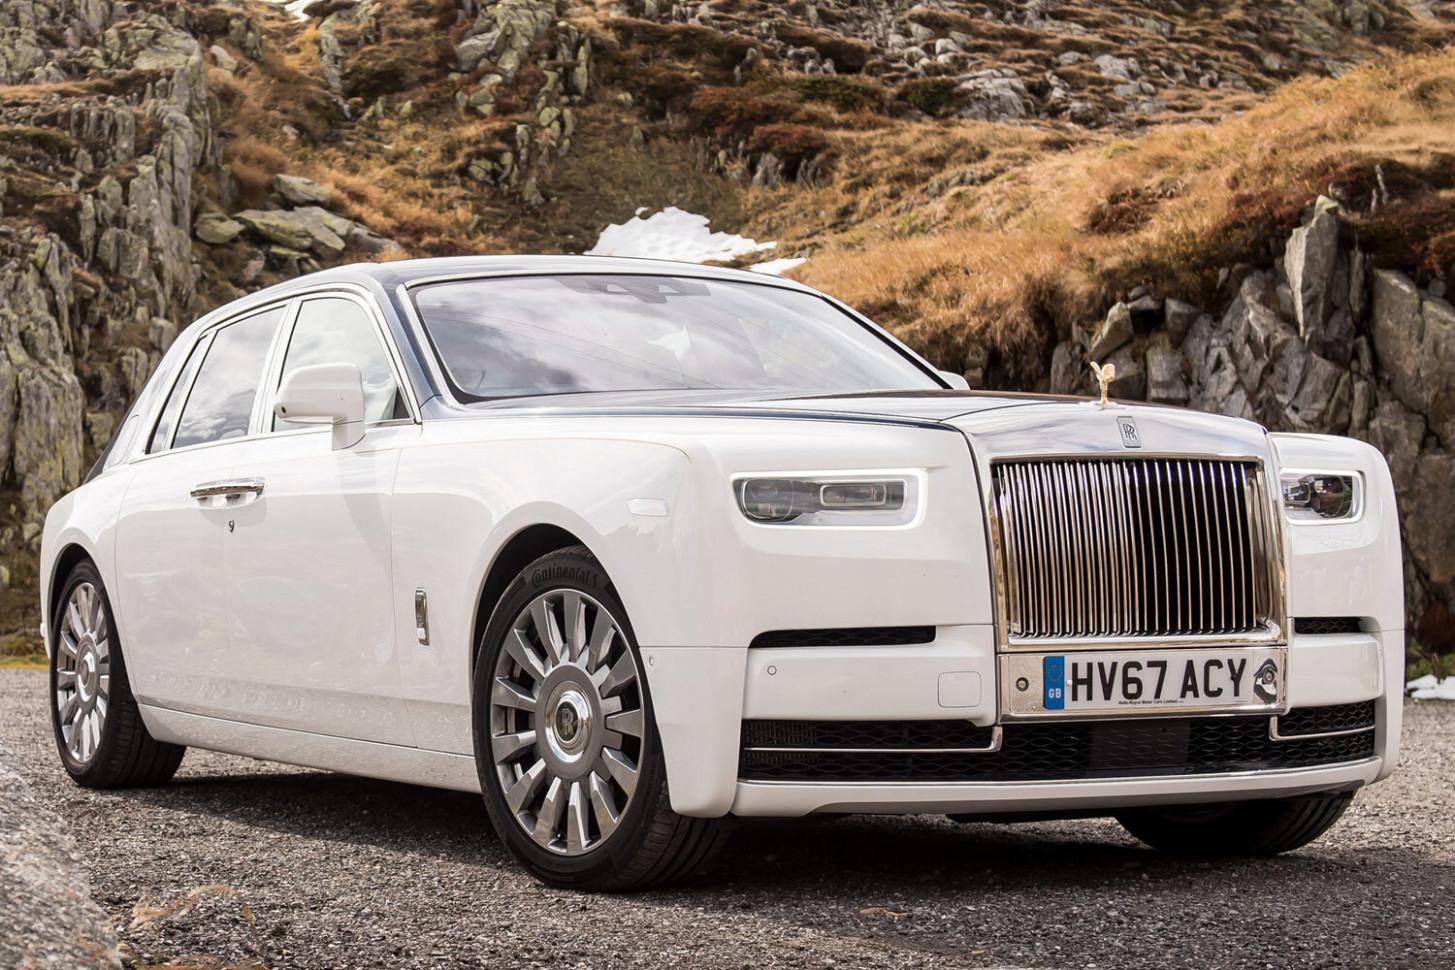 Exterior 2022 Rolls Royce Phantoms